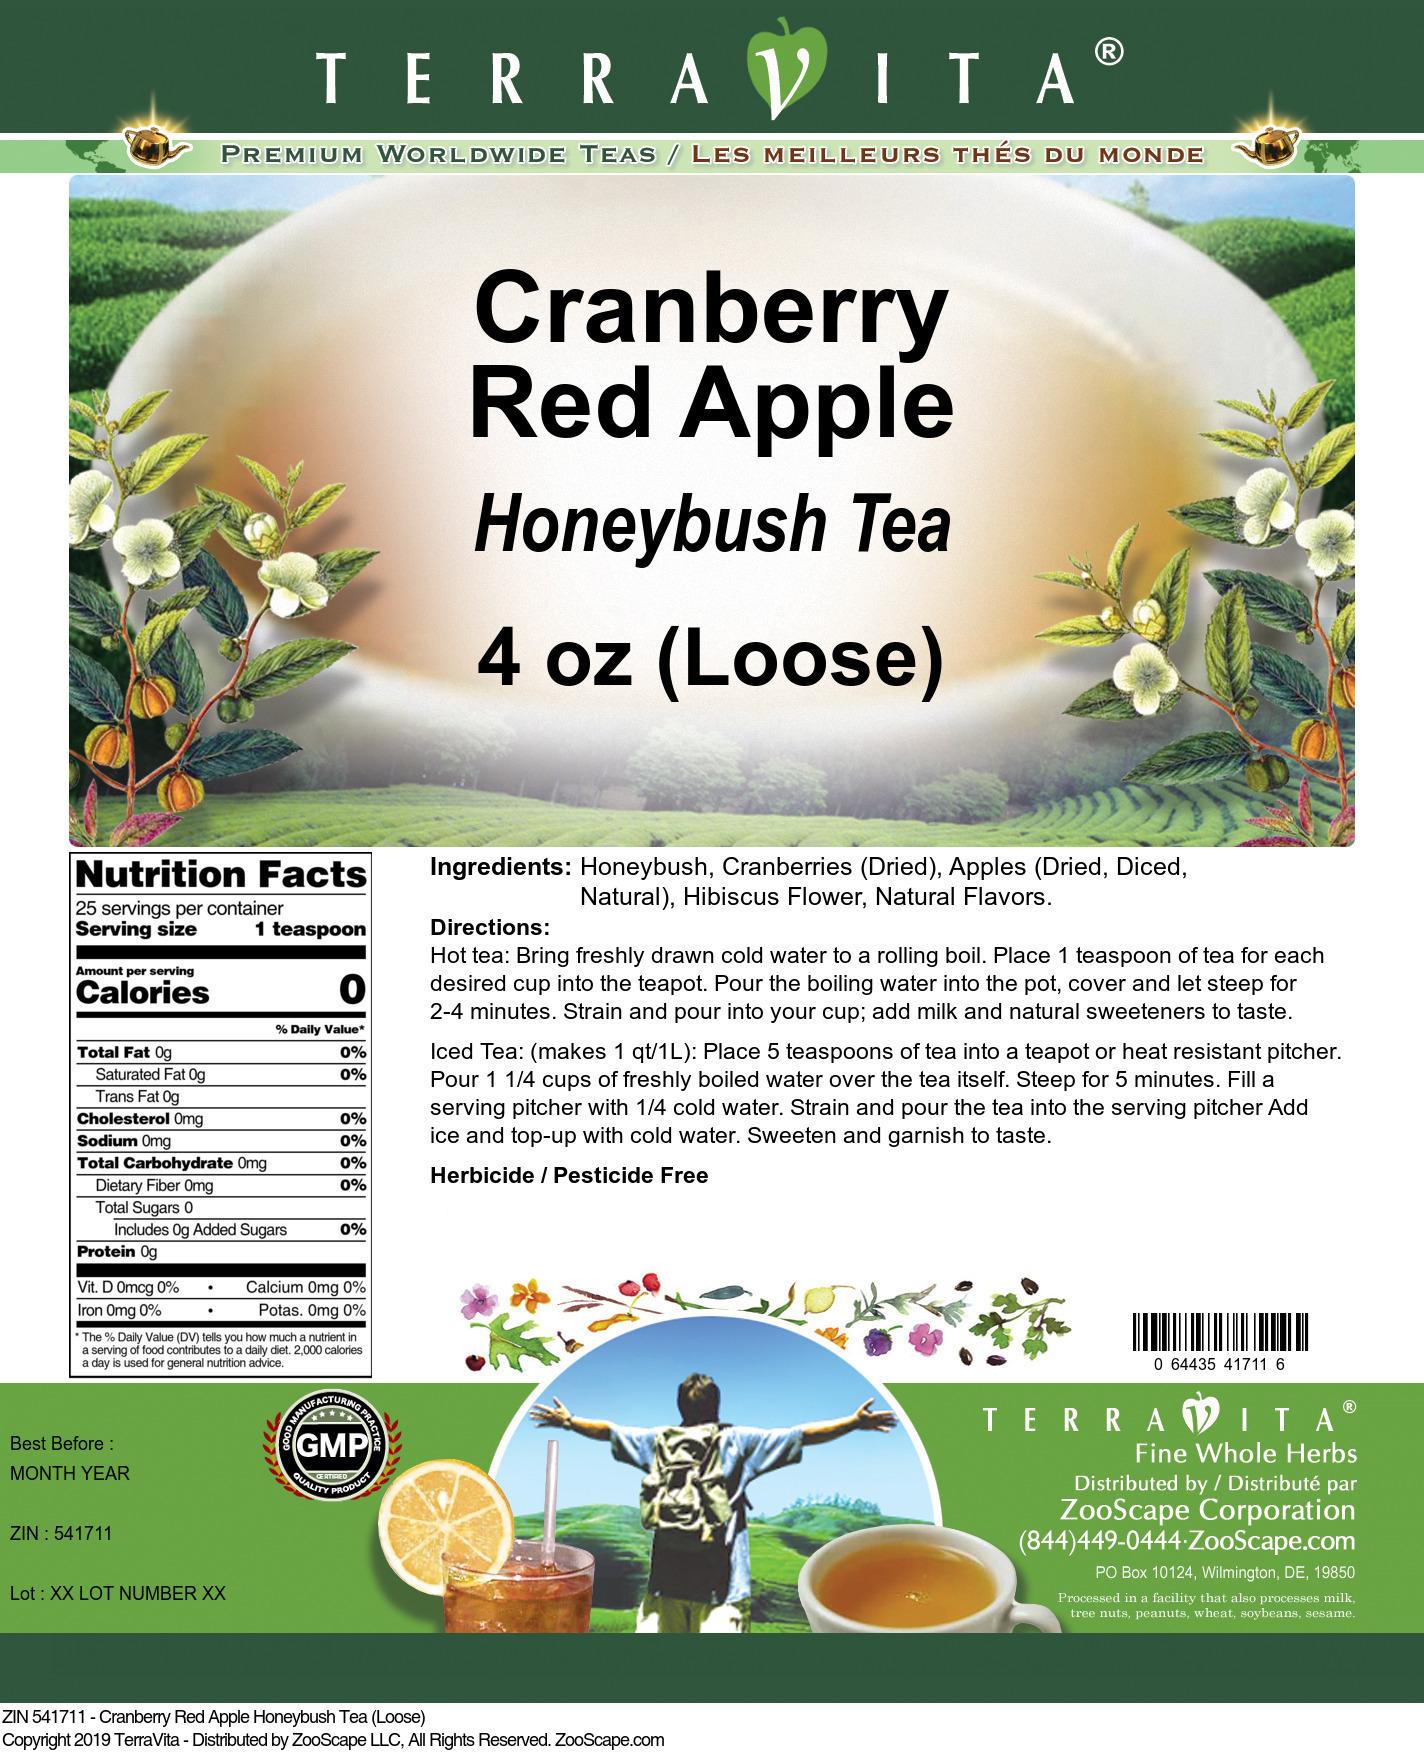 Cranberry Red Apple Honeybush Tea